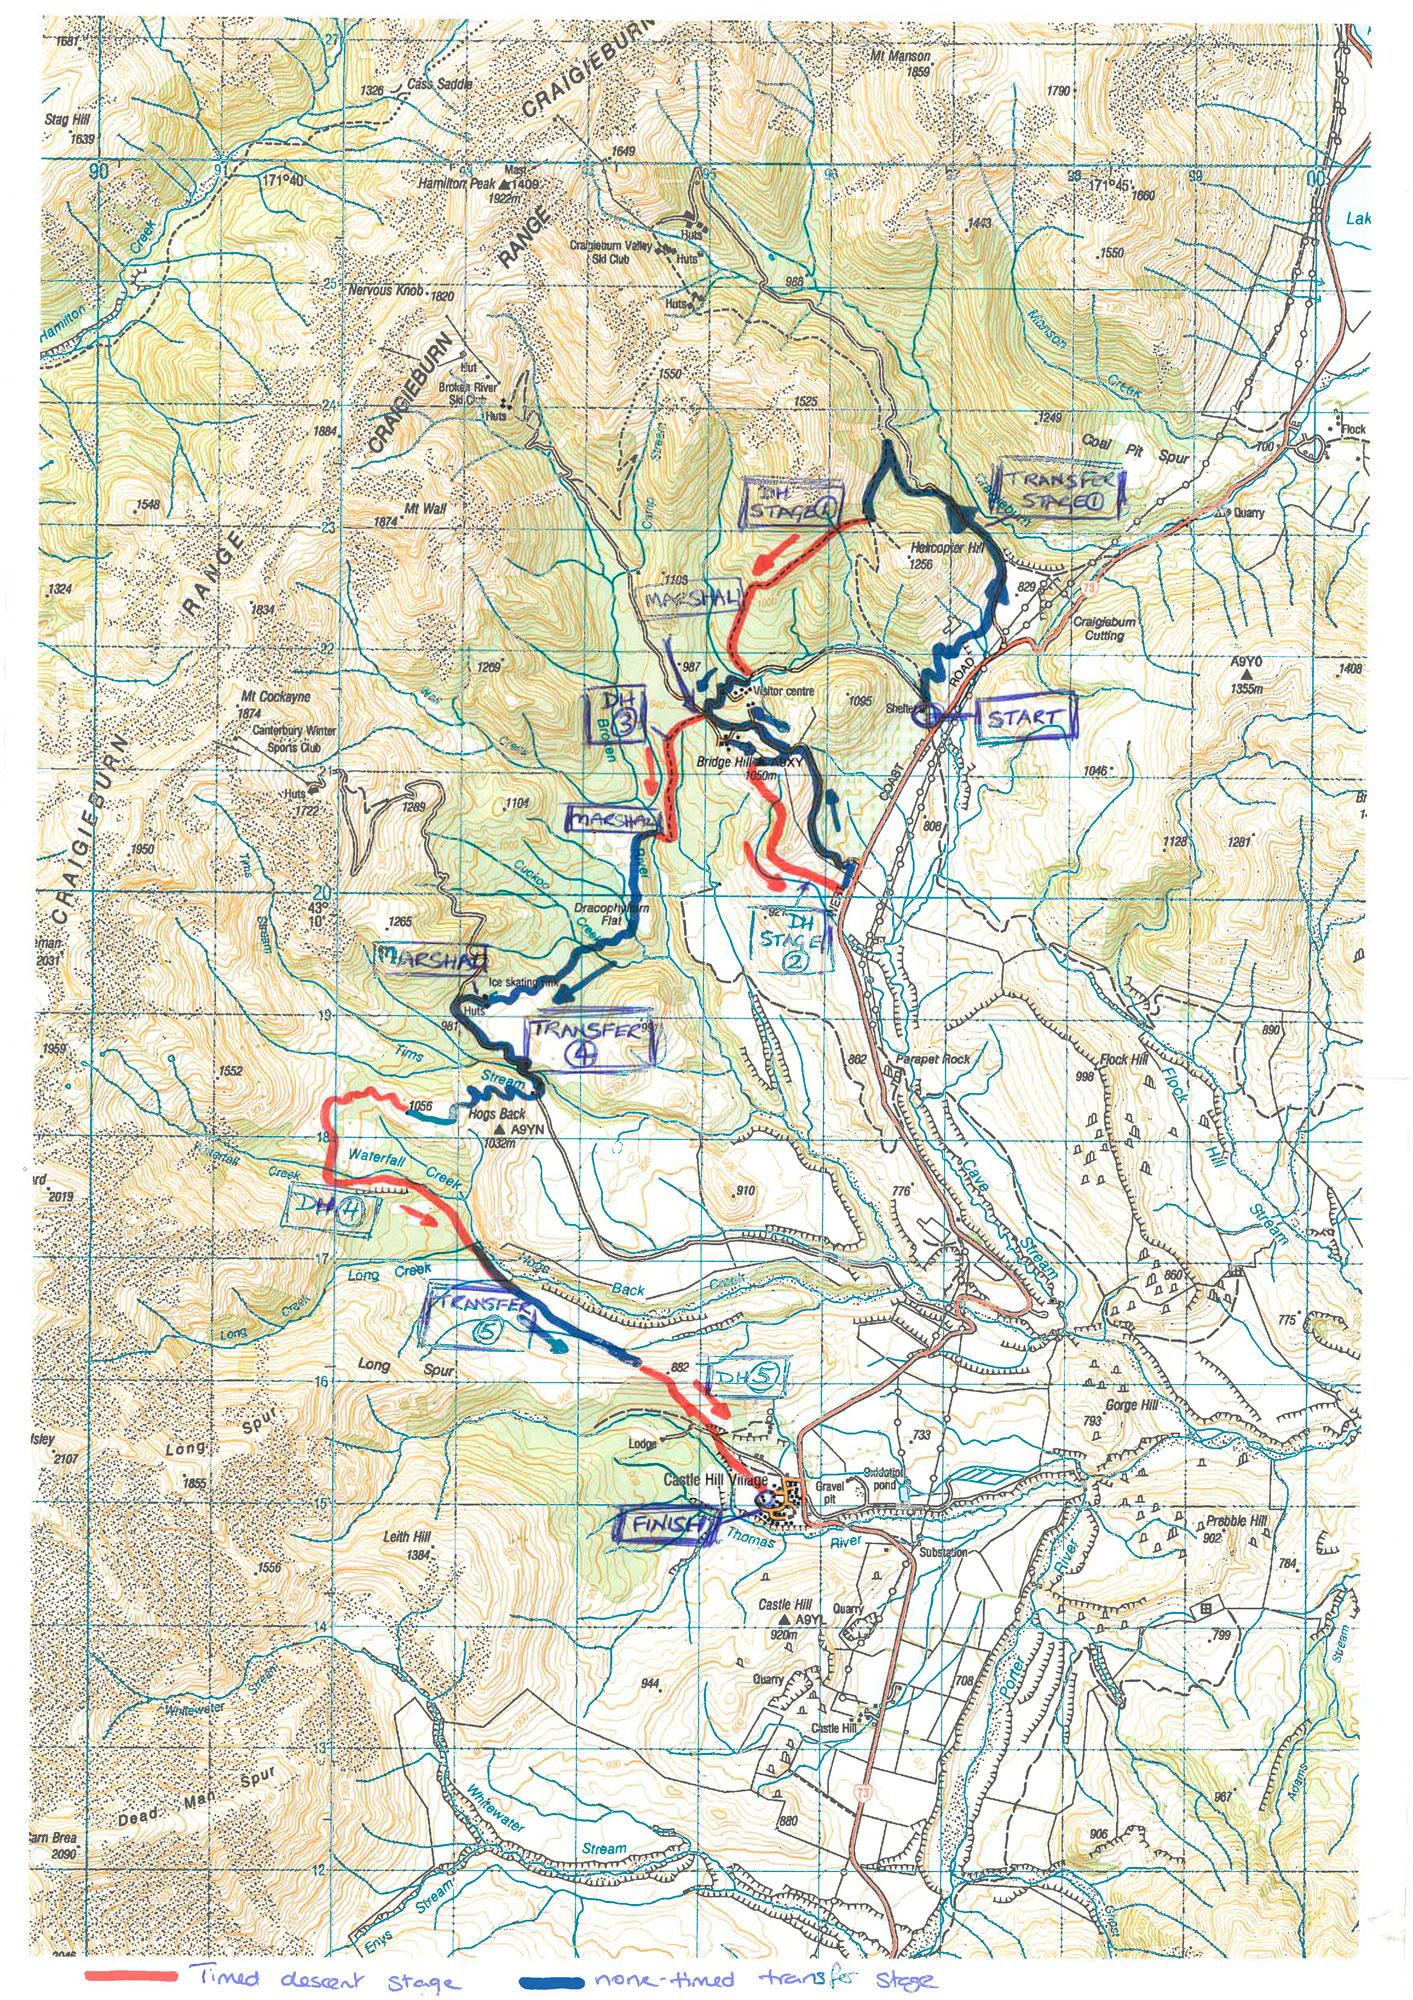 Craigieburn-course-map-1